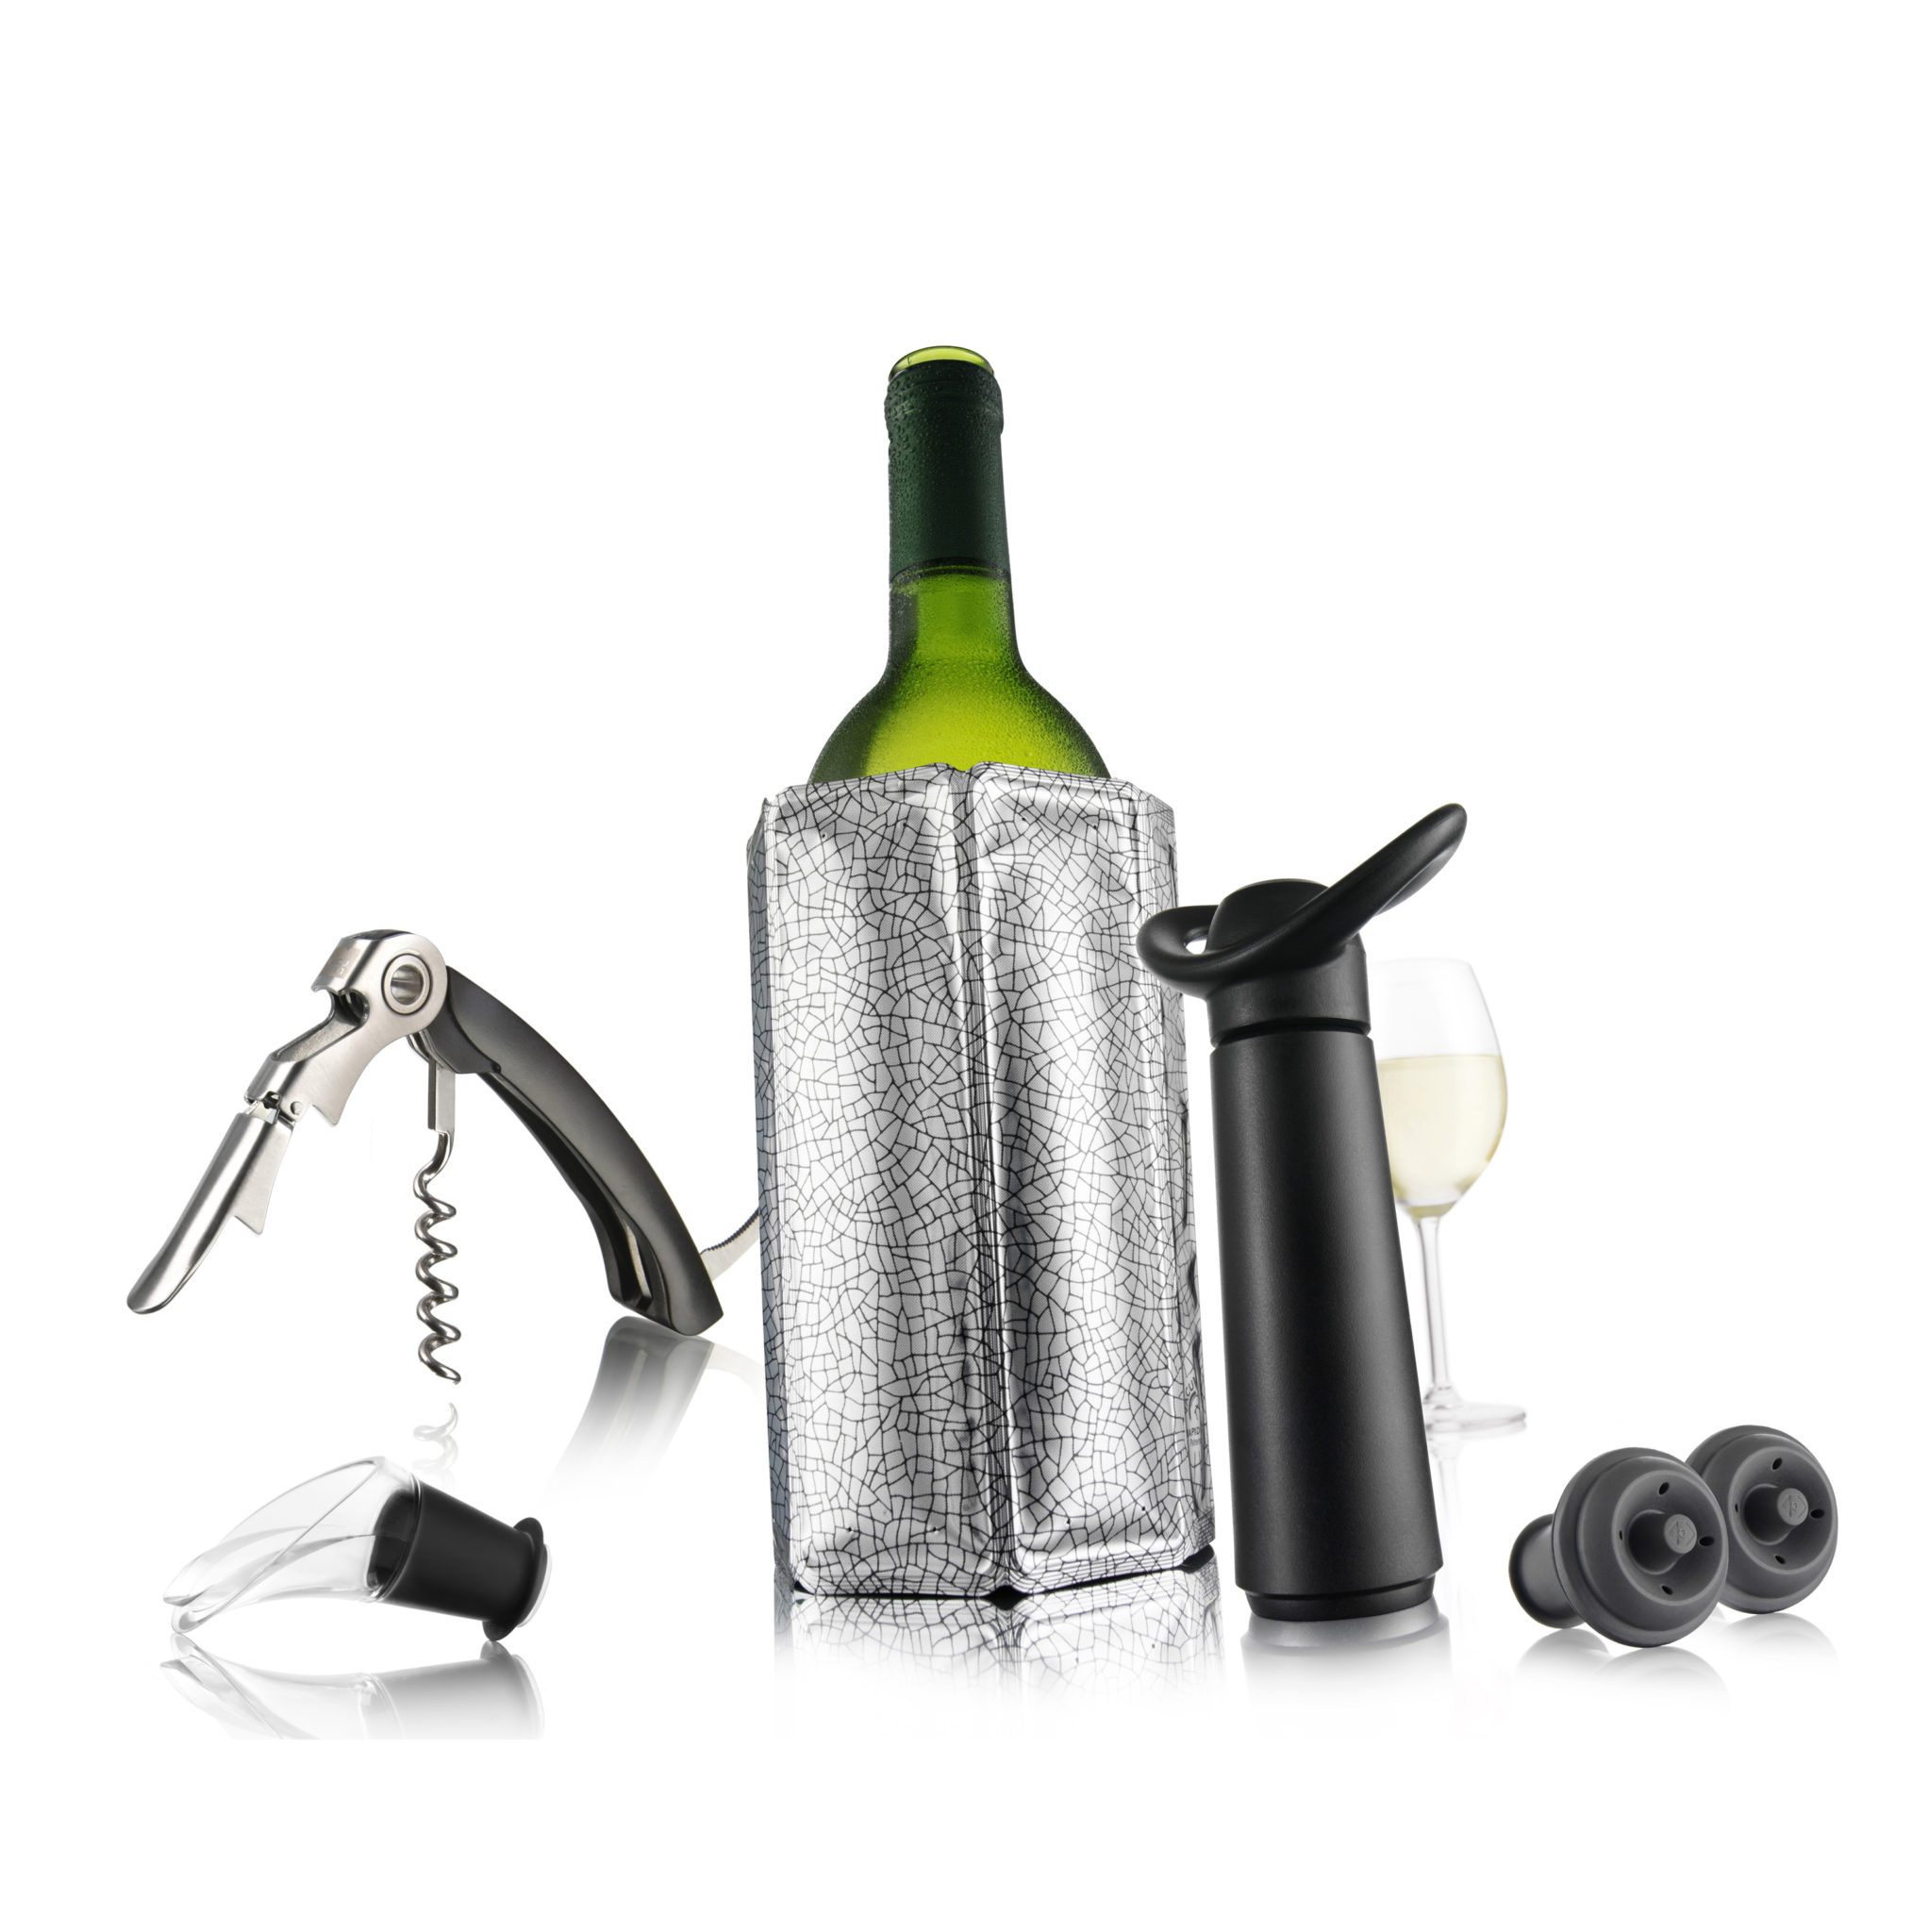 VV6889060 Vacu Vin Wine Essentials Gift Set